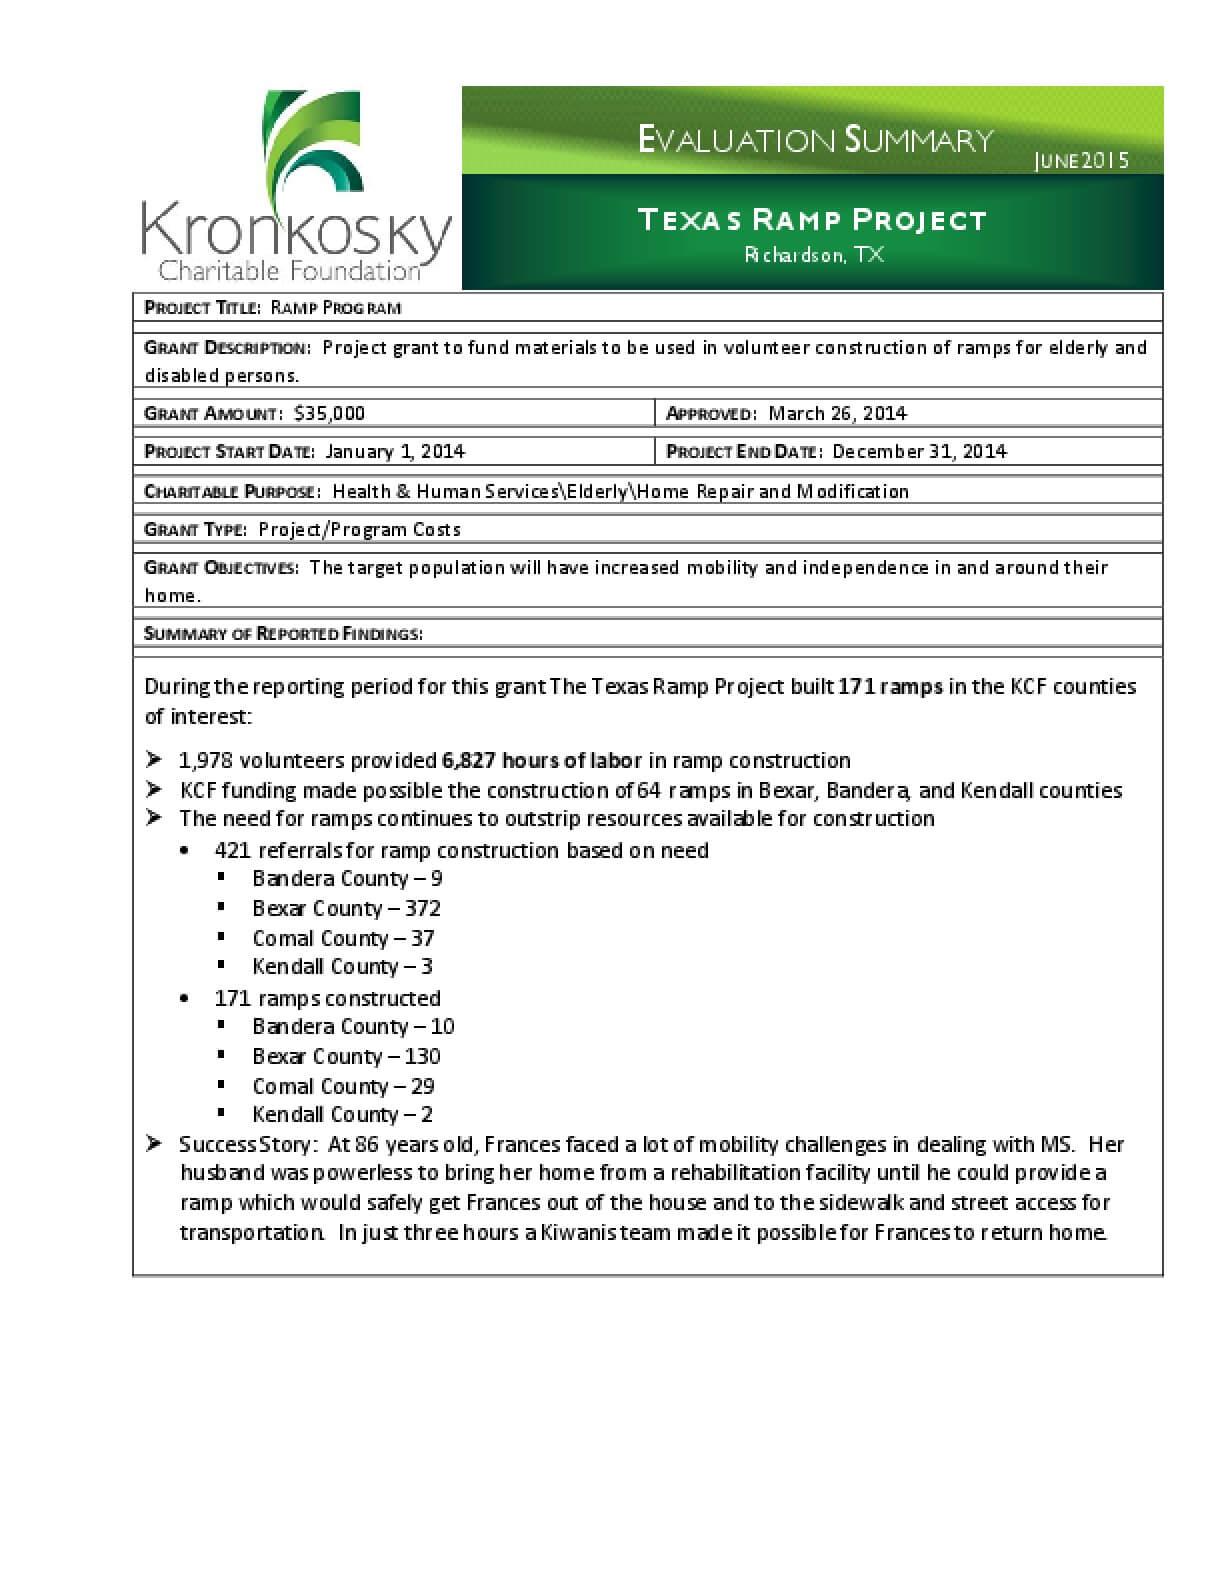 Texas Ramp Project Evaluation Summary